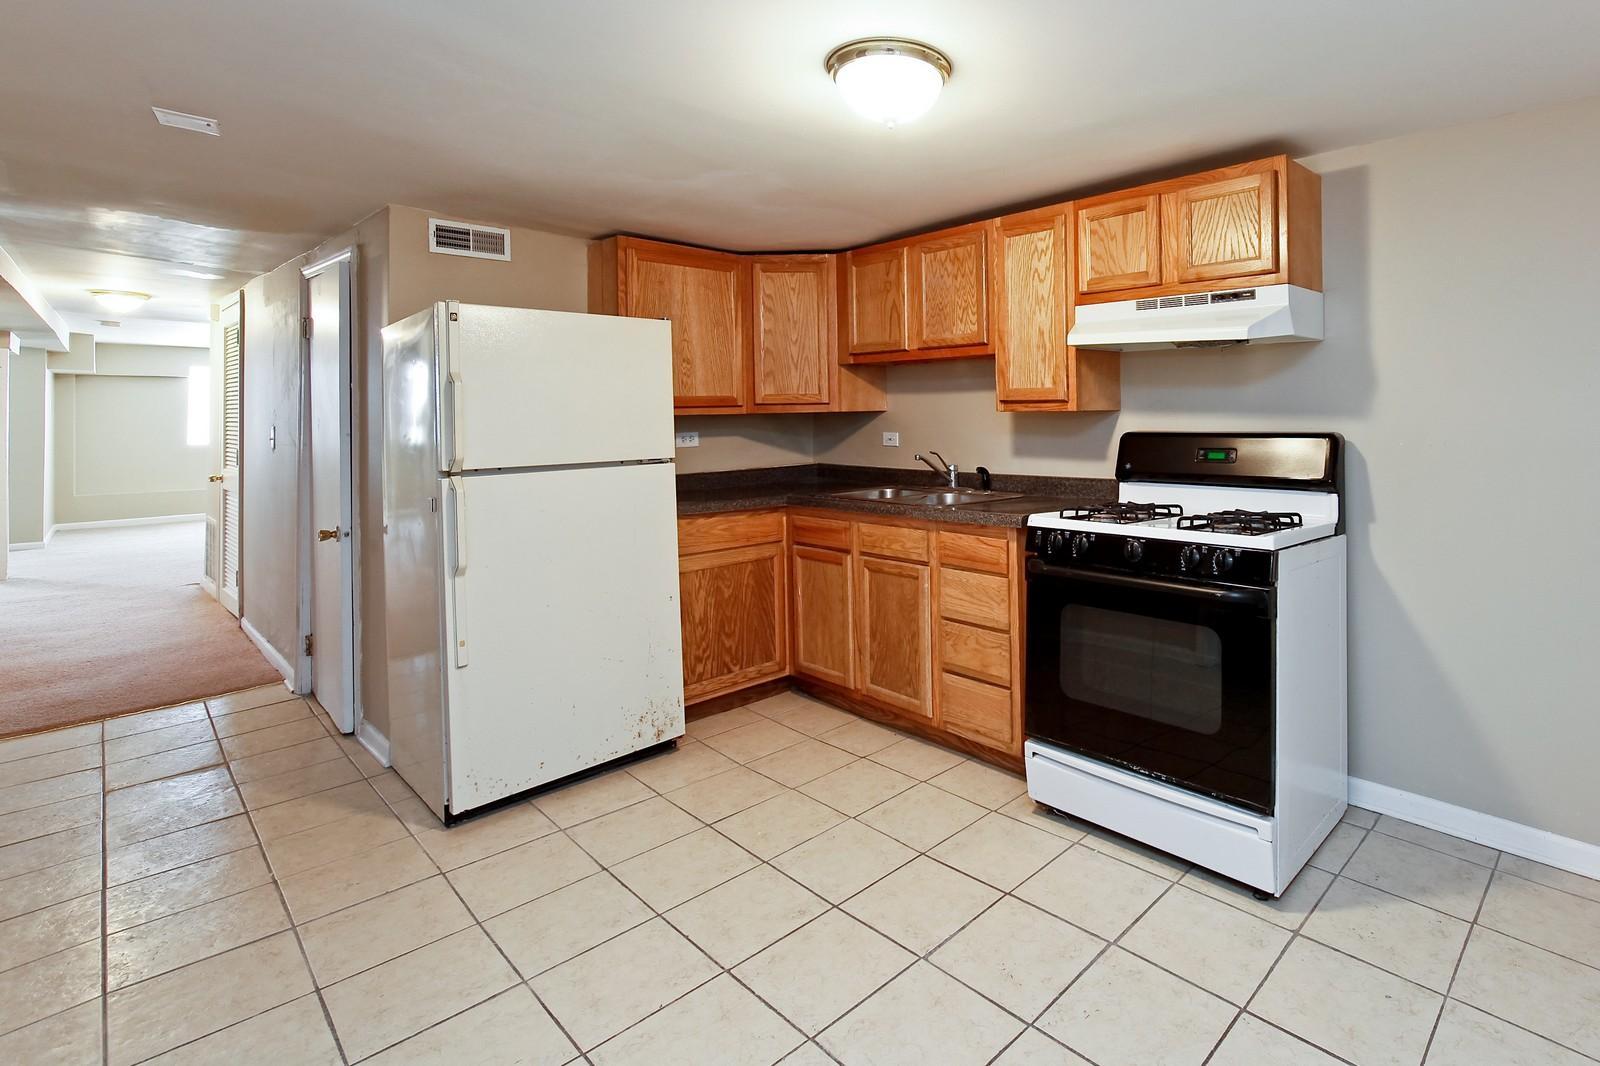 Real Estate Photography - 3332 W Polk St, Chicago, IL, 60624 - Kitchen